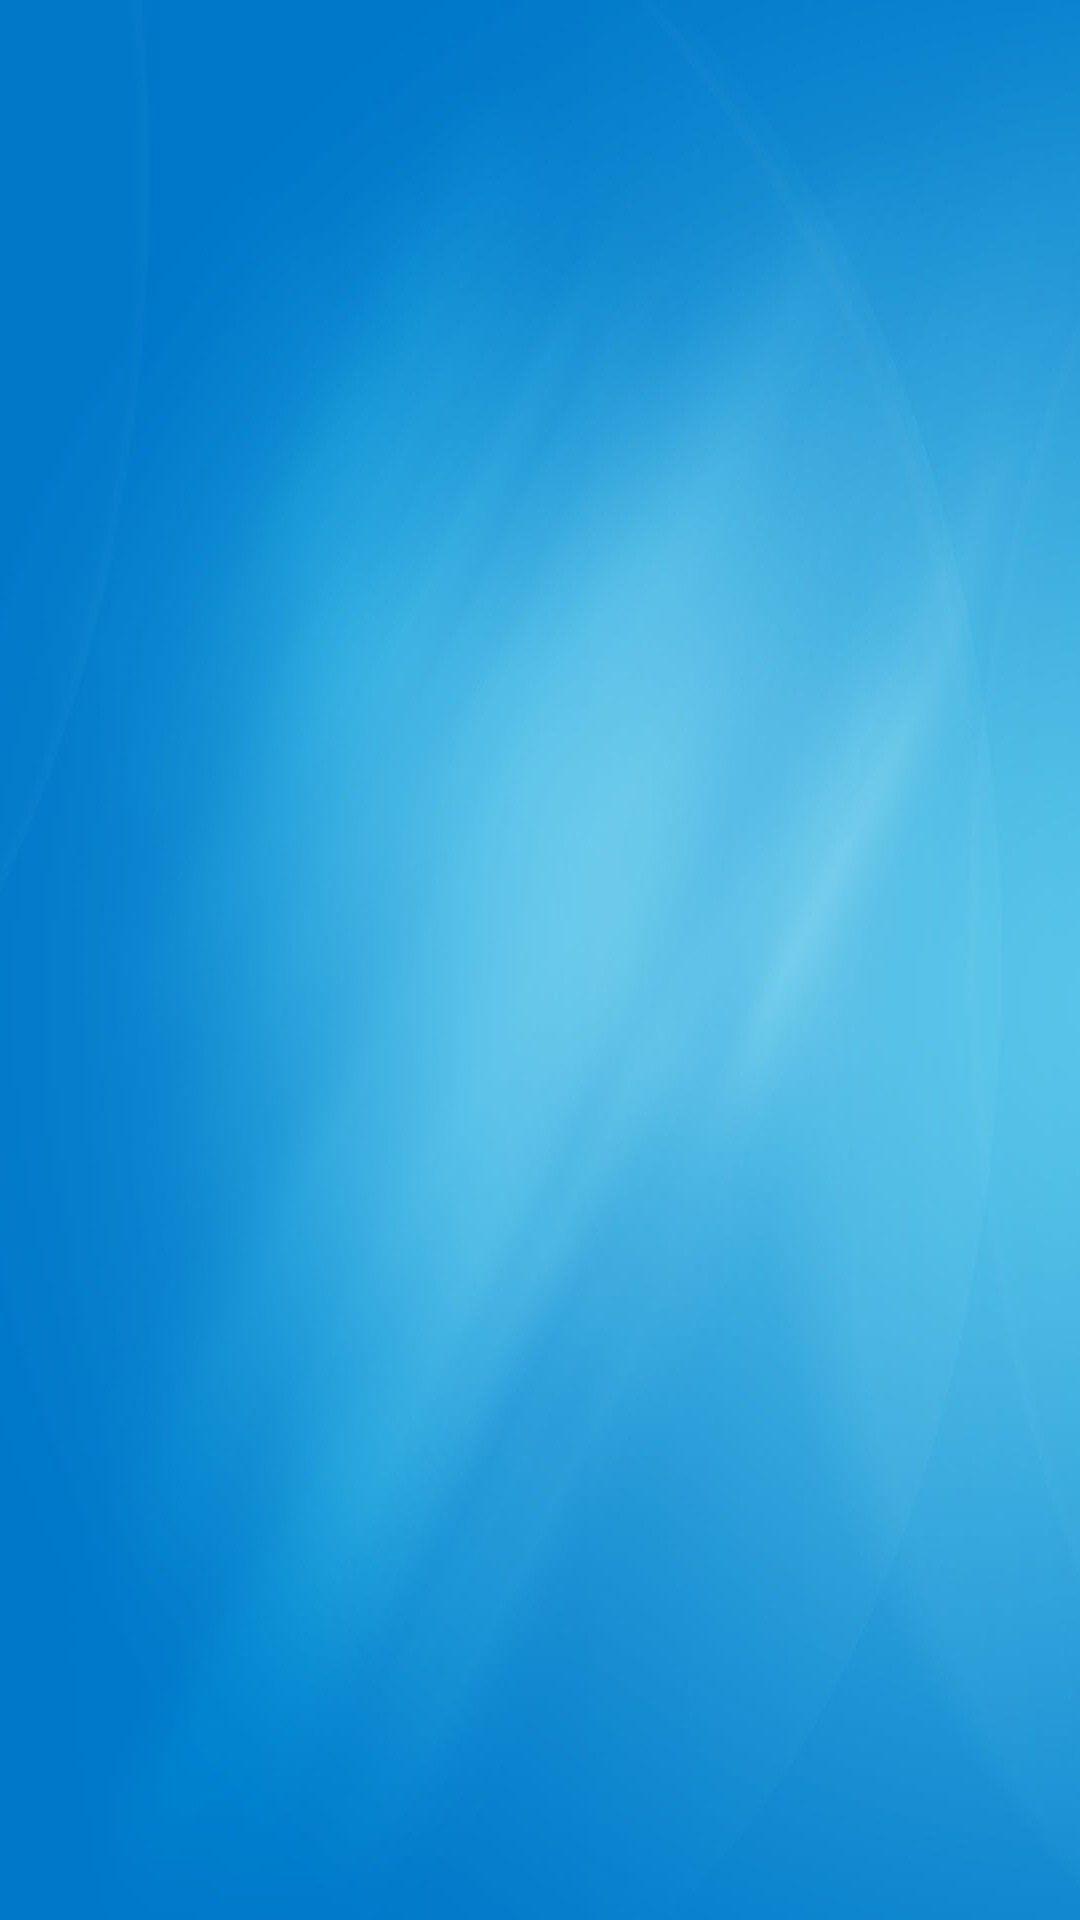 Blue Wallpaper Iphone 5c Blue Wallpaper Iphone Blue